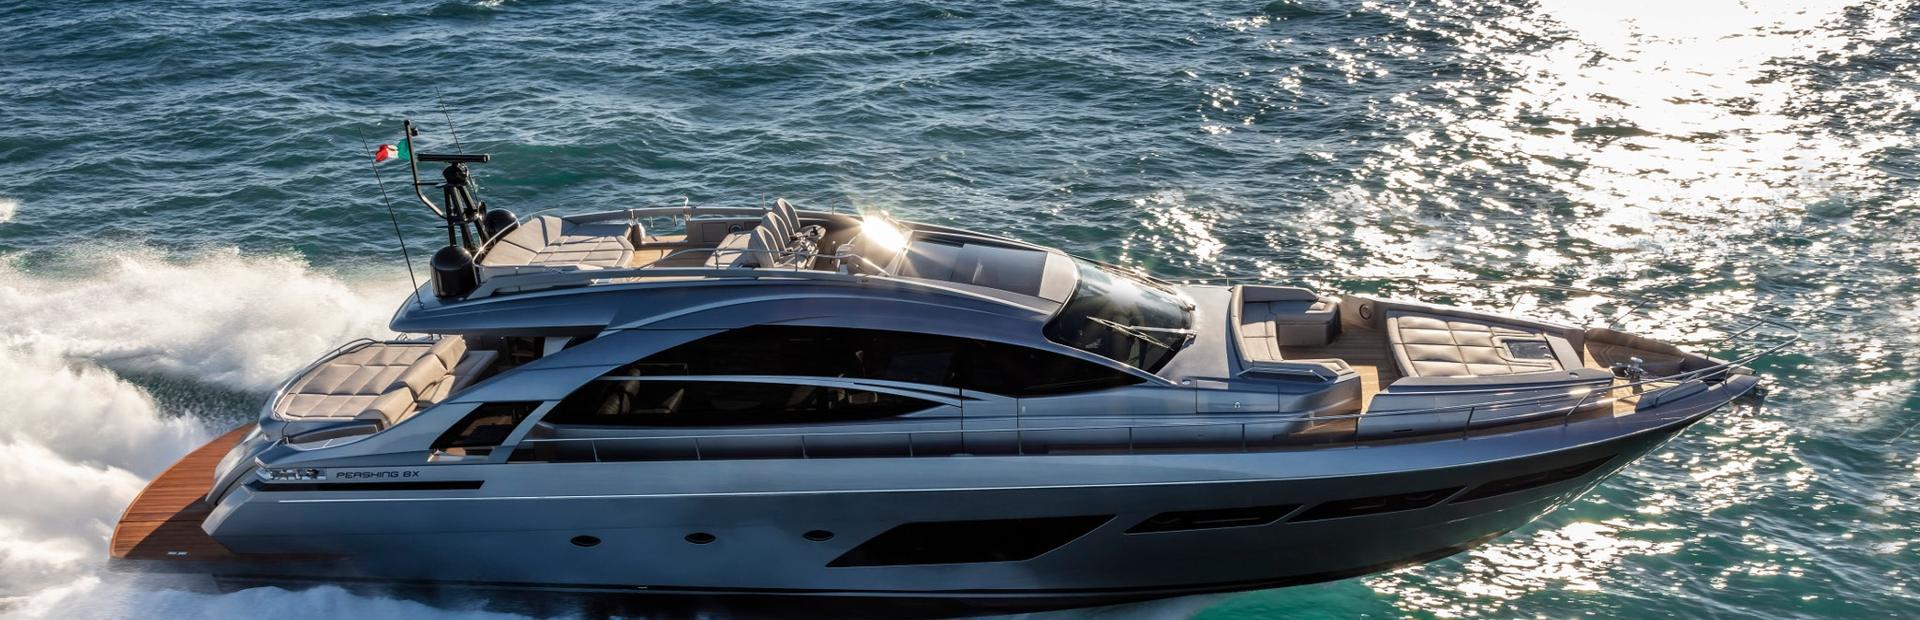 Pershing 8X Yacht Charter